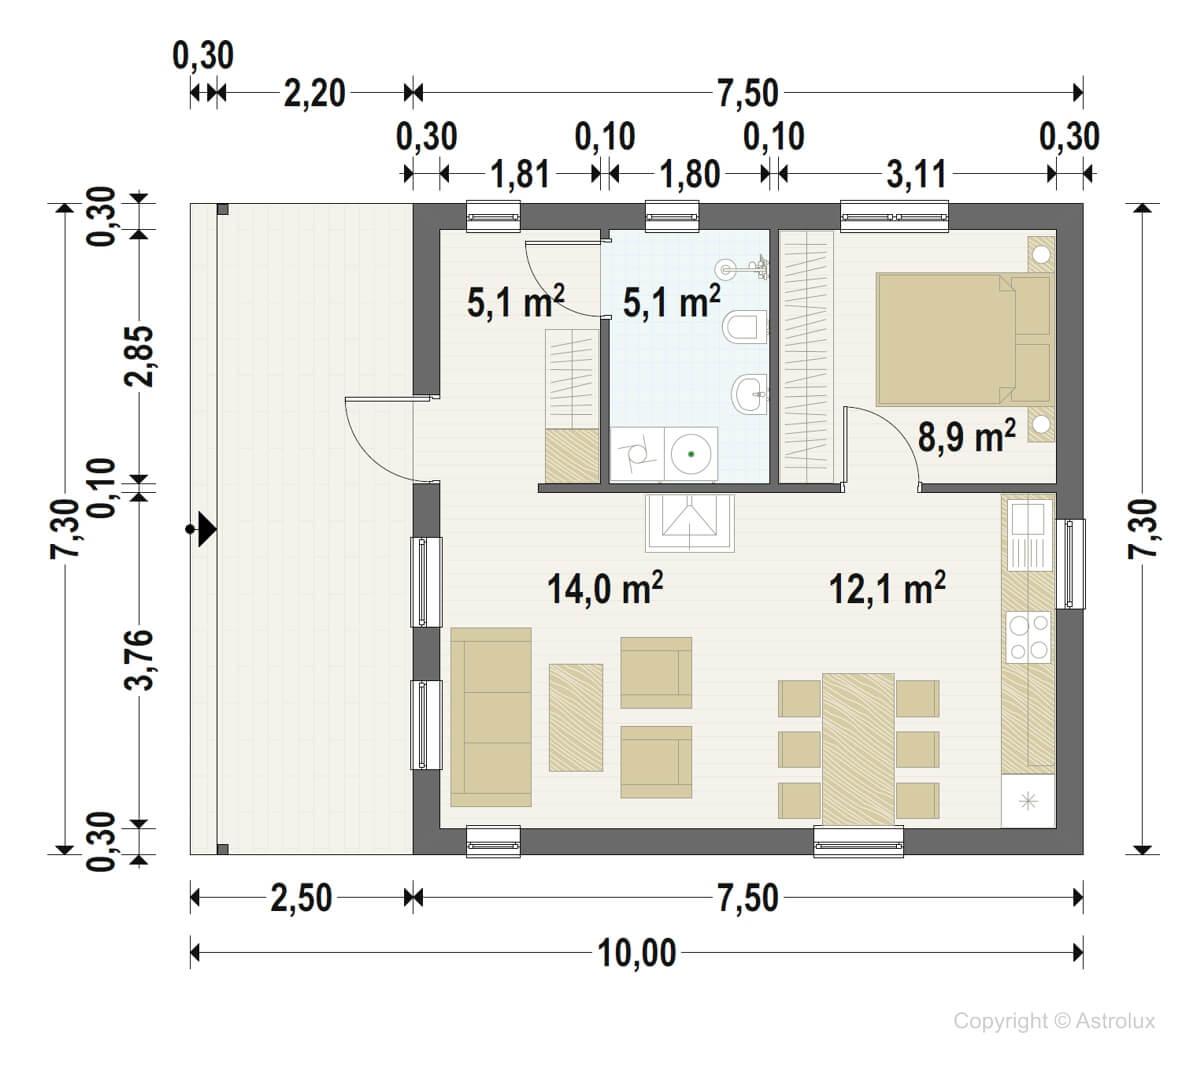 elementmajad moodulmajad astrolux A73-3